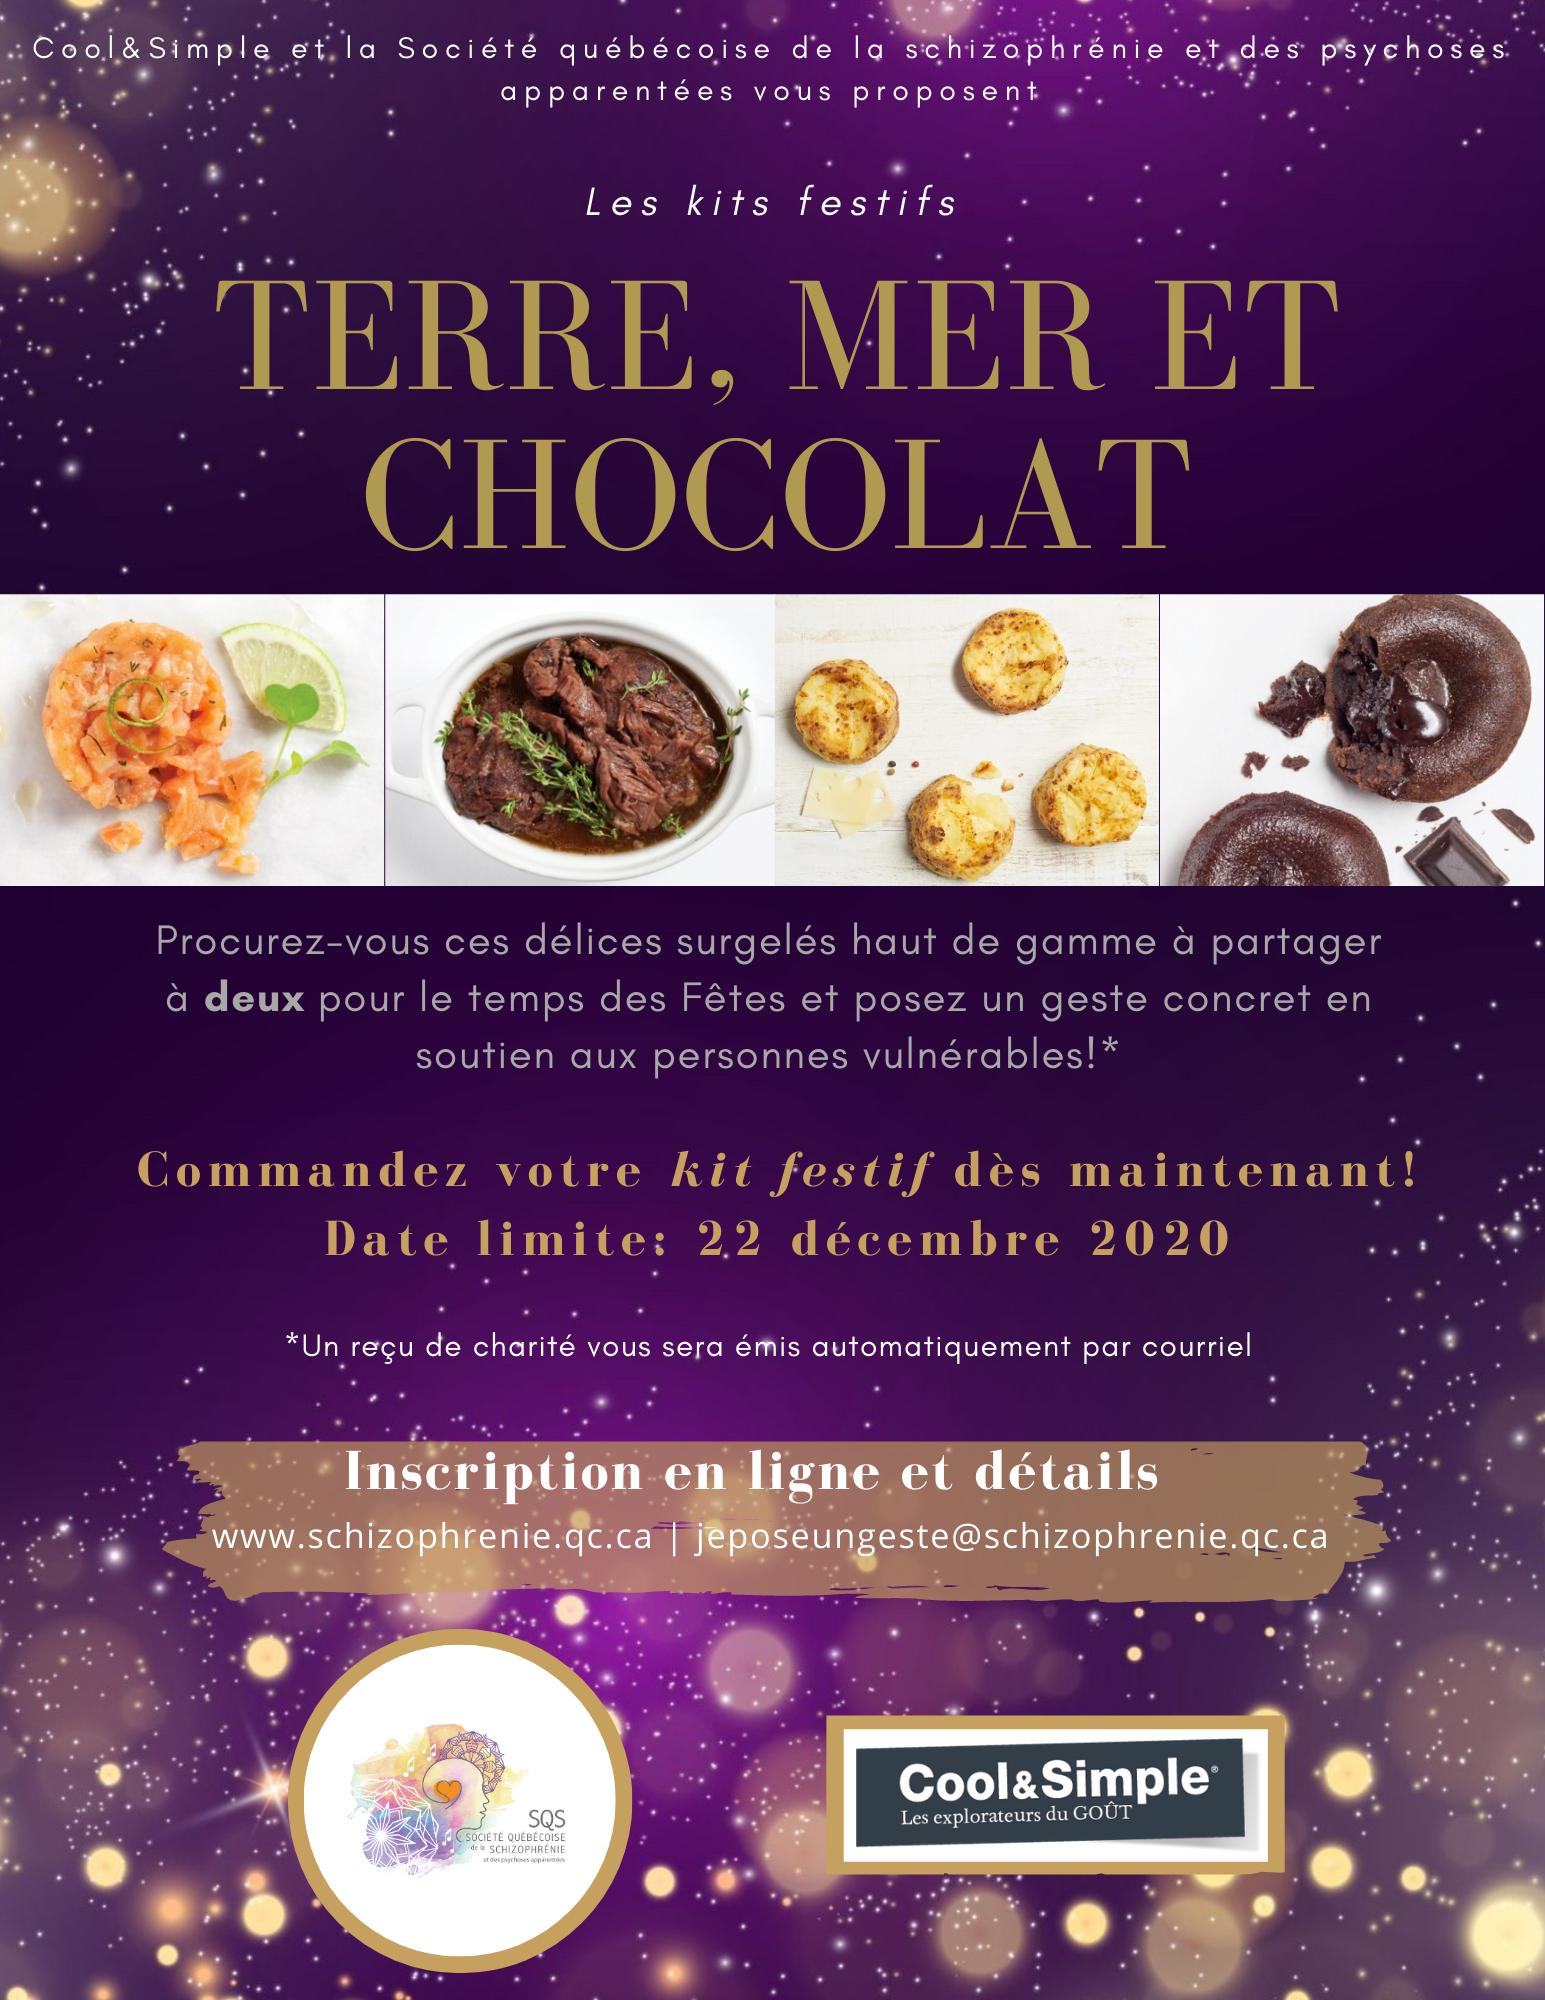 KIT FESTIF  «TERRE, MER ET CHOCOLAT» : COLLABORATION COOL&SIMPLE